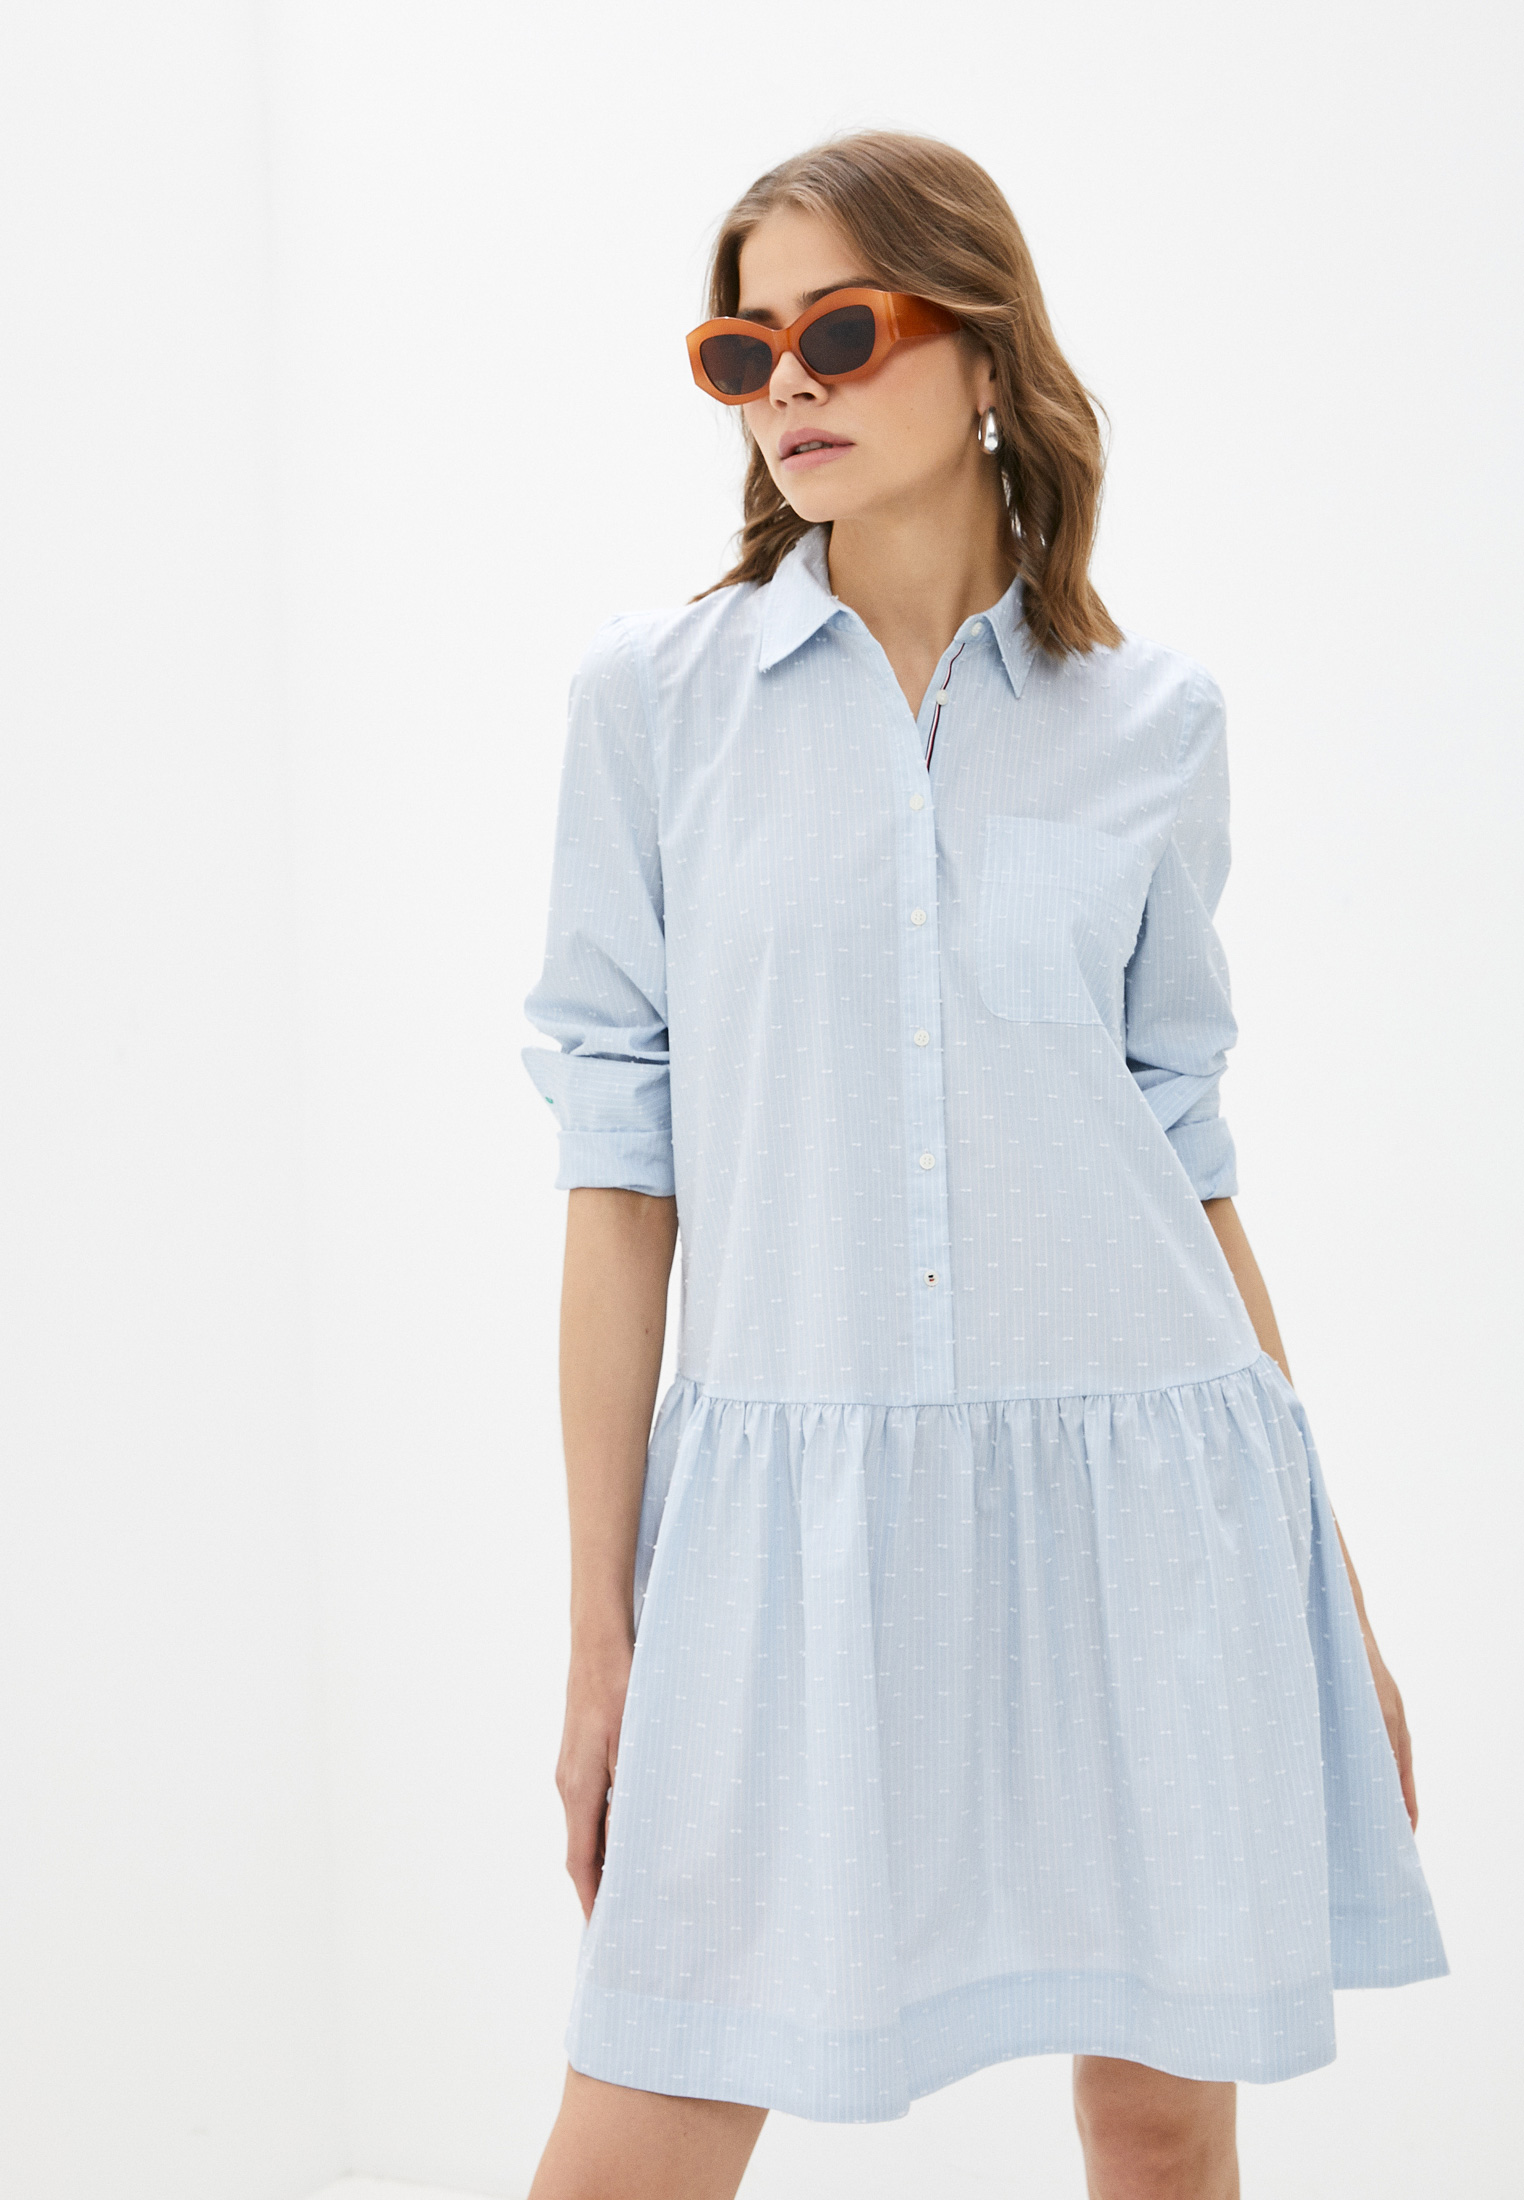 Платье Tommy Hilfiger (Томми Хилфигер) WW0WW30358